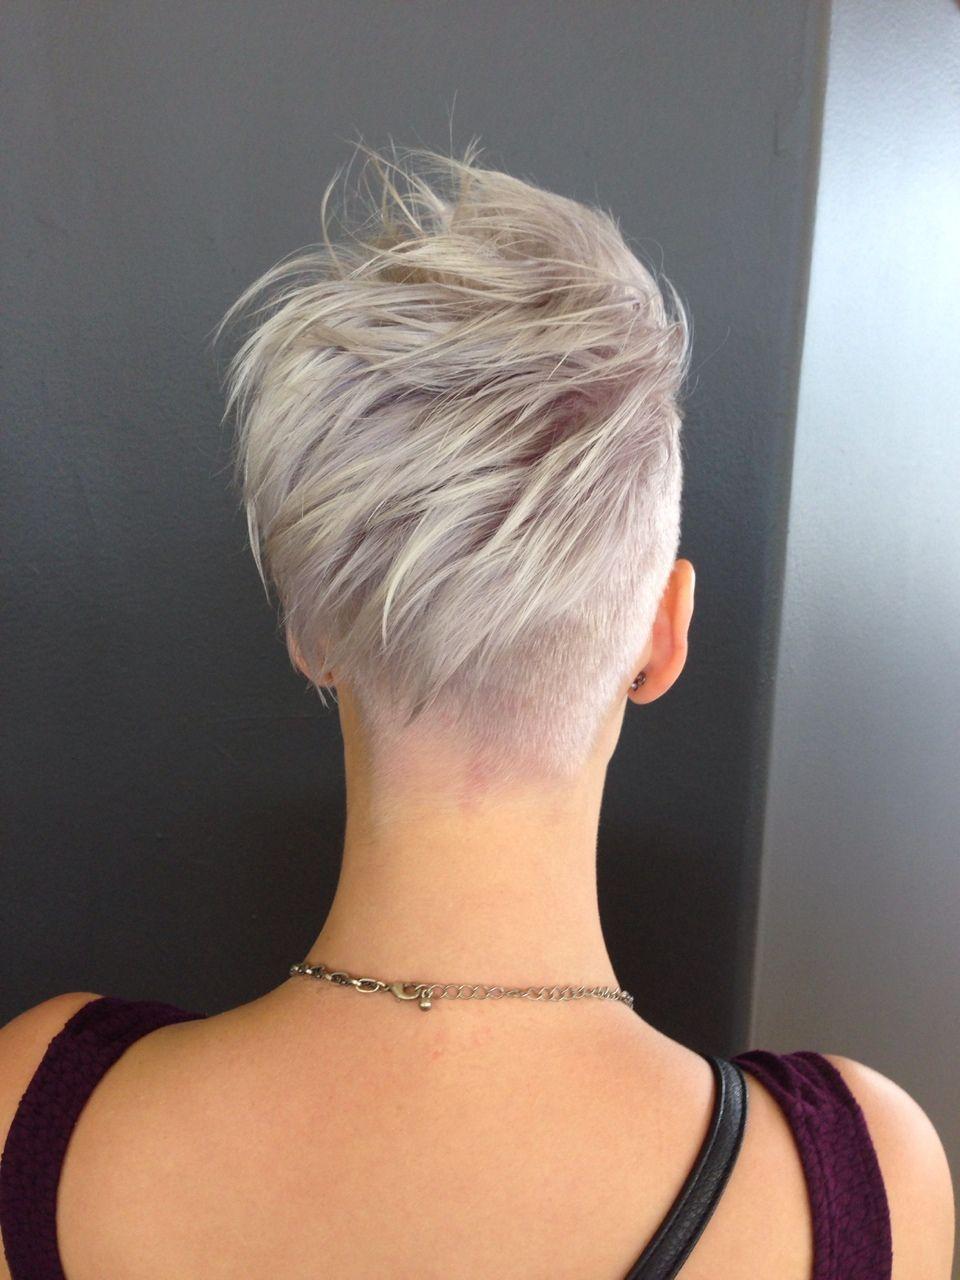 Mymohawksbetterthanurs uc colored my hair itus rather purpley